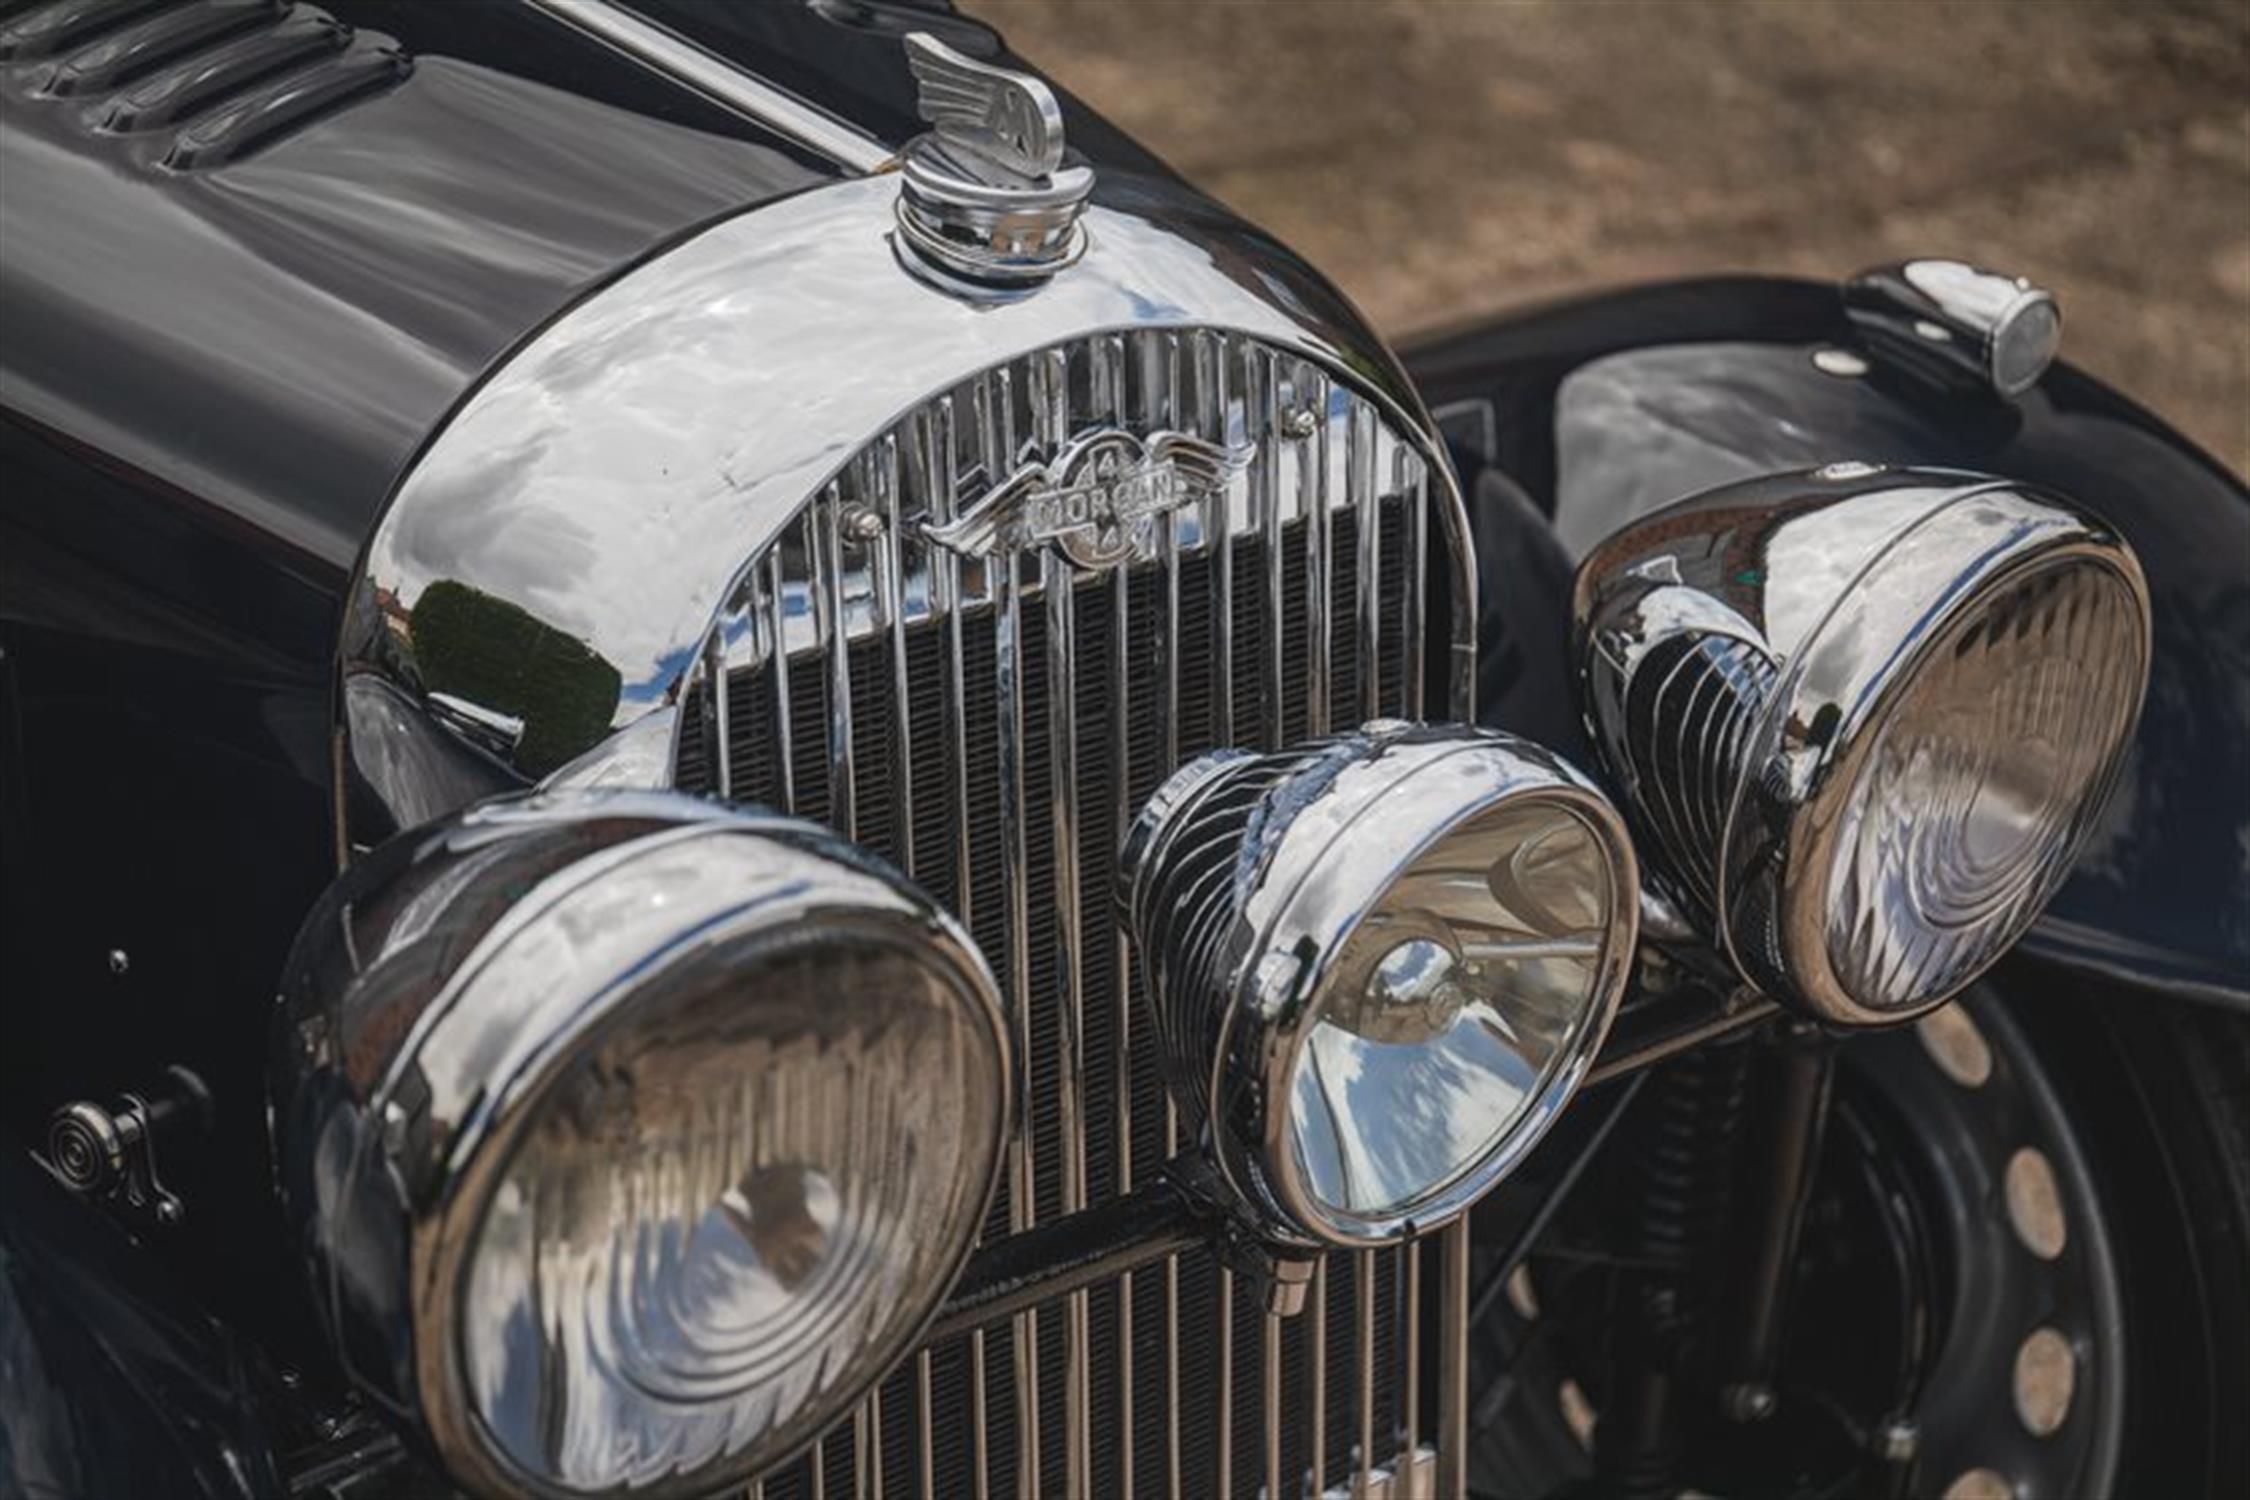 1939 Morgan 4/4 Series 1 'Flat Rad' (1098cc Climax Engine) - Image 9 of 10